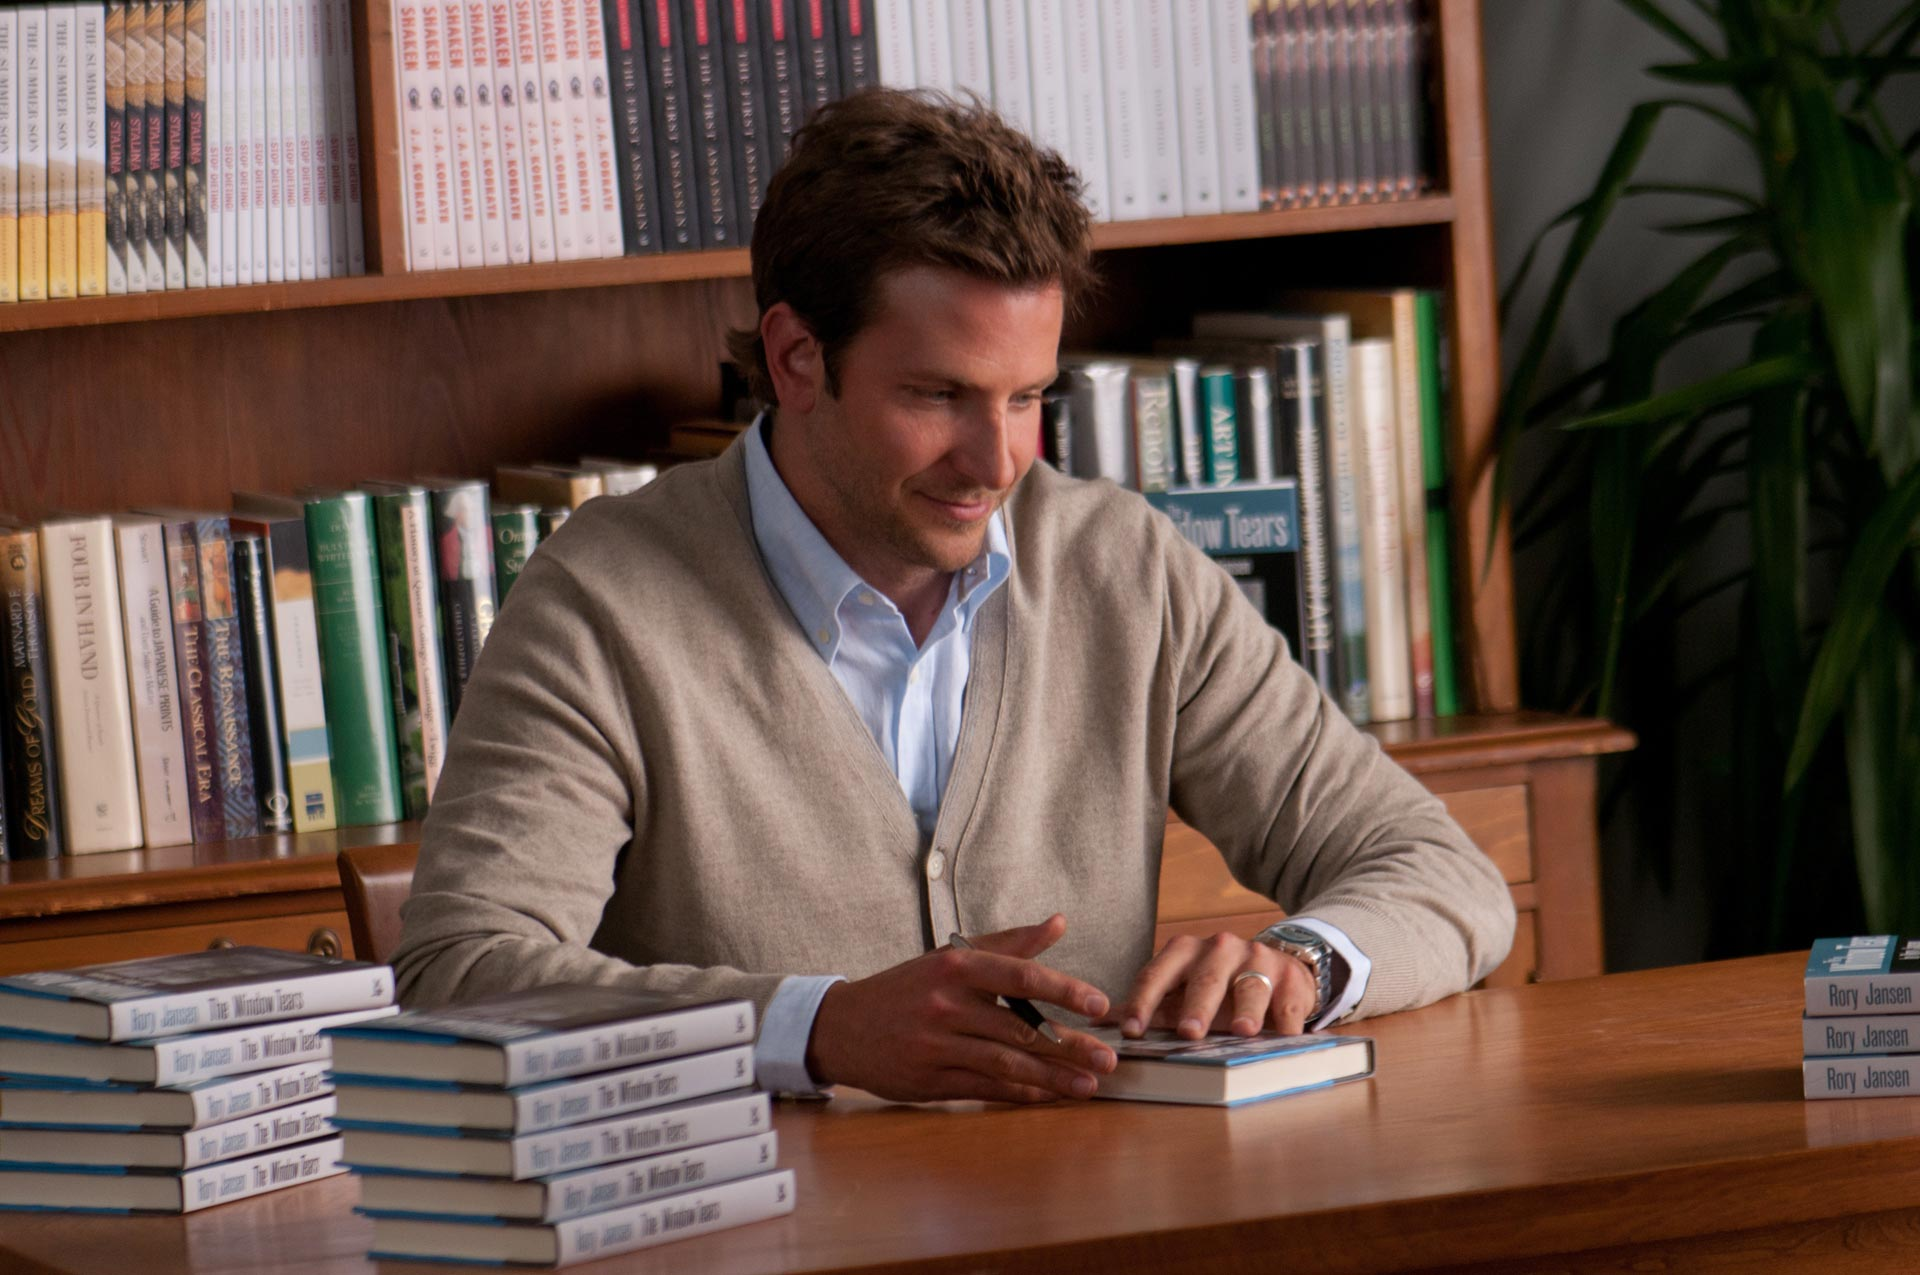 THE WORDS Movie Photos (+27) The Words Bradley Cooper